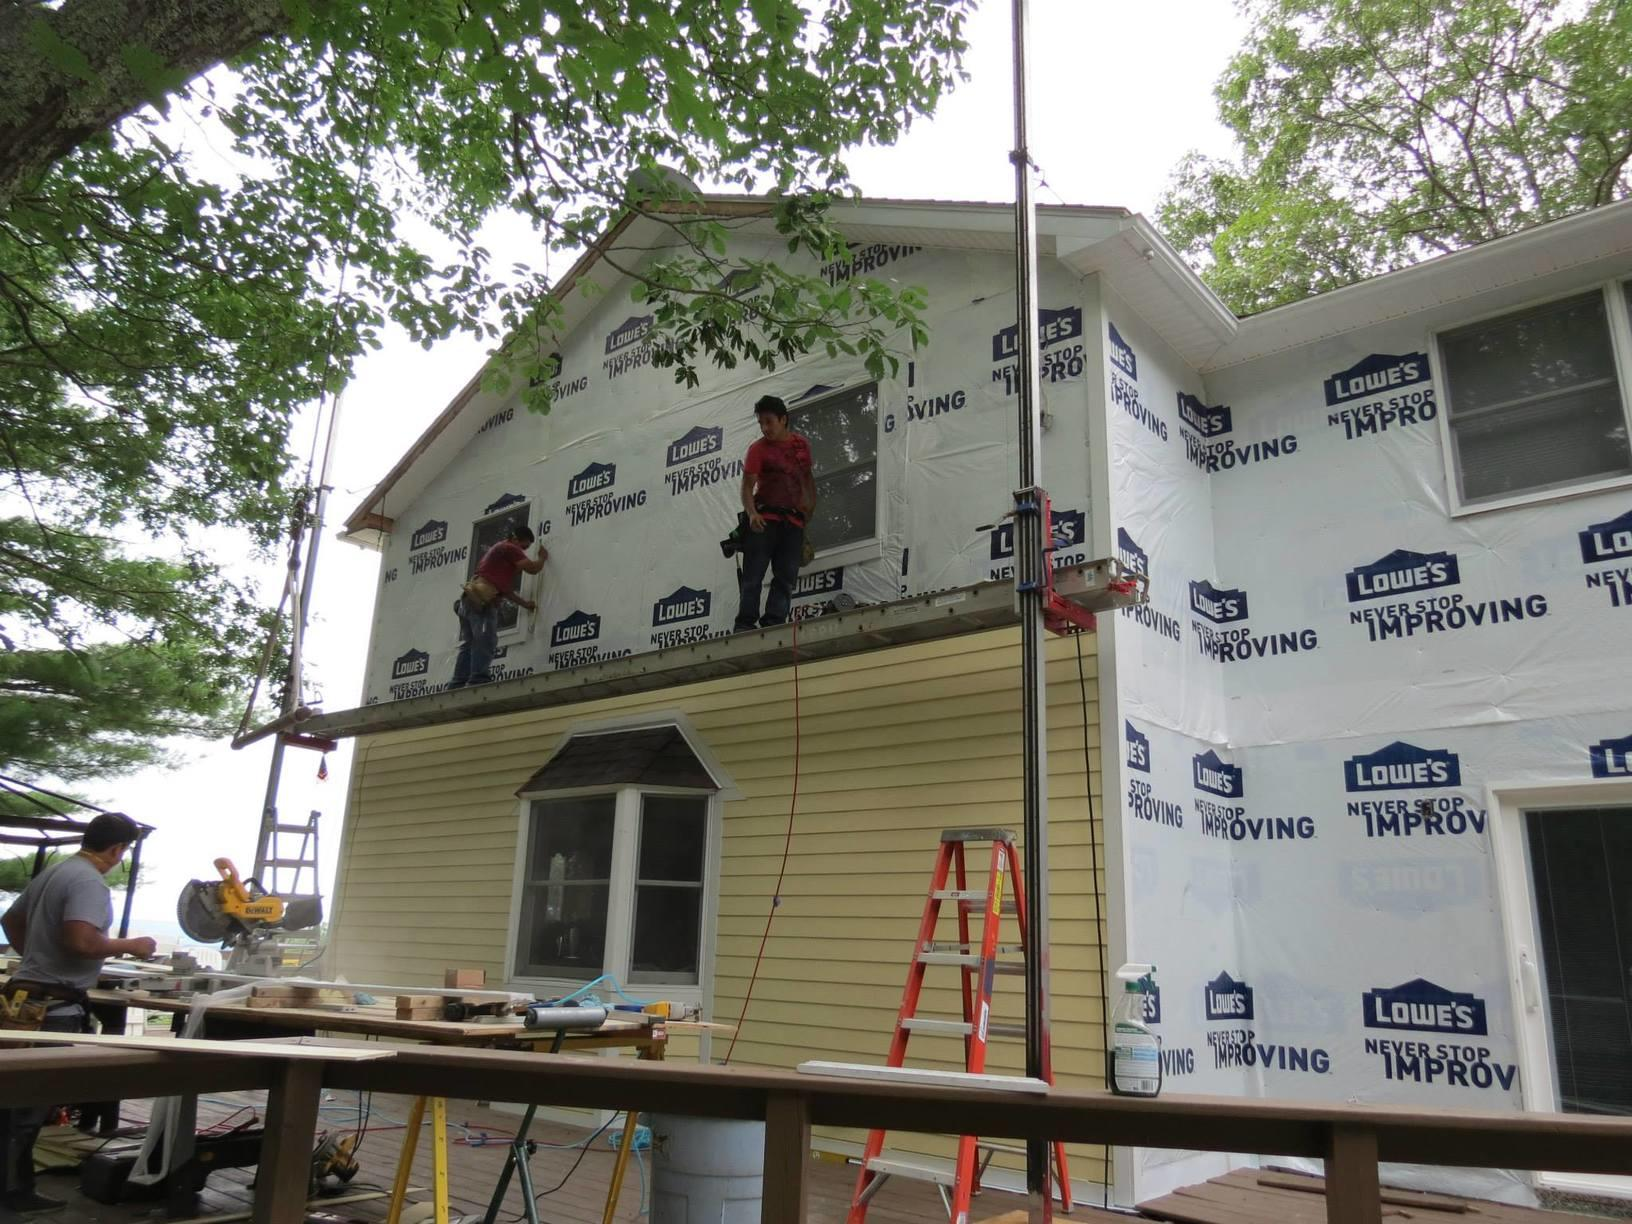 Installing the New Siding in Olivebridge, NY